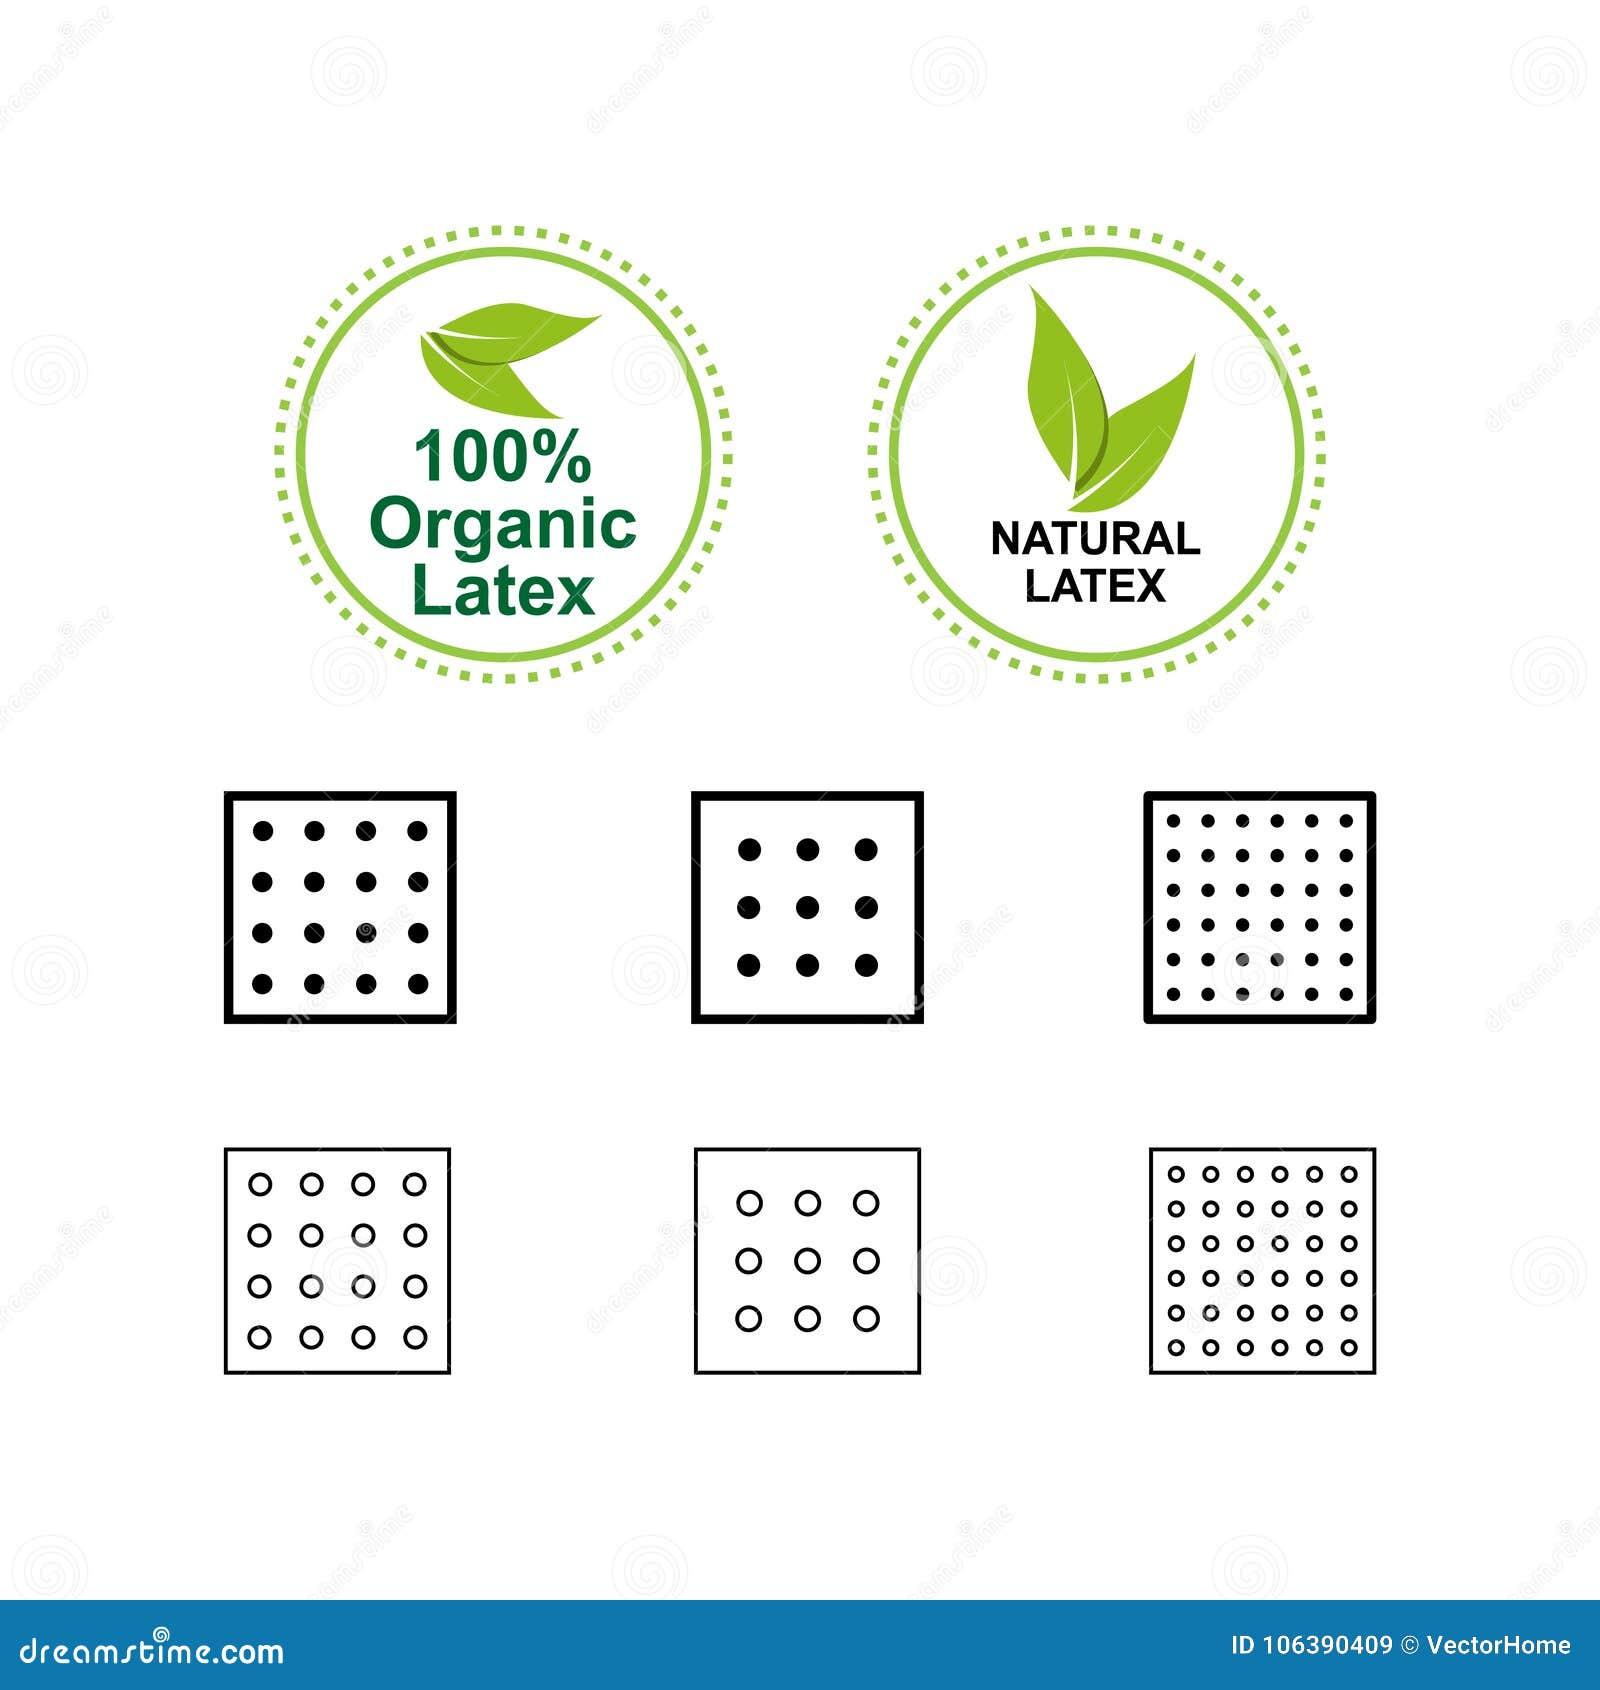 Latex Mattress Icon Vector Illustration Stock Vector